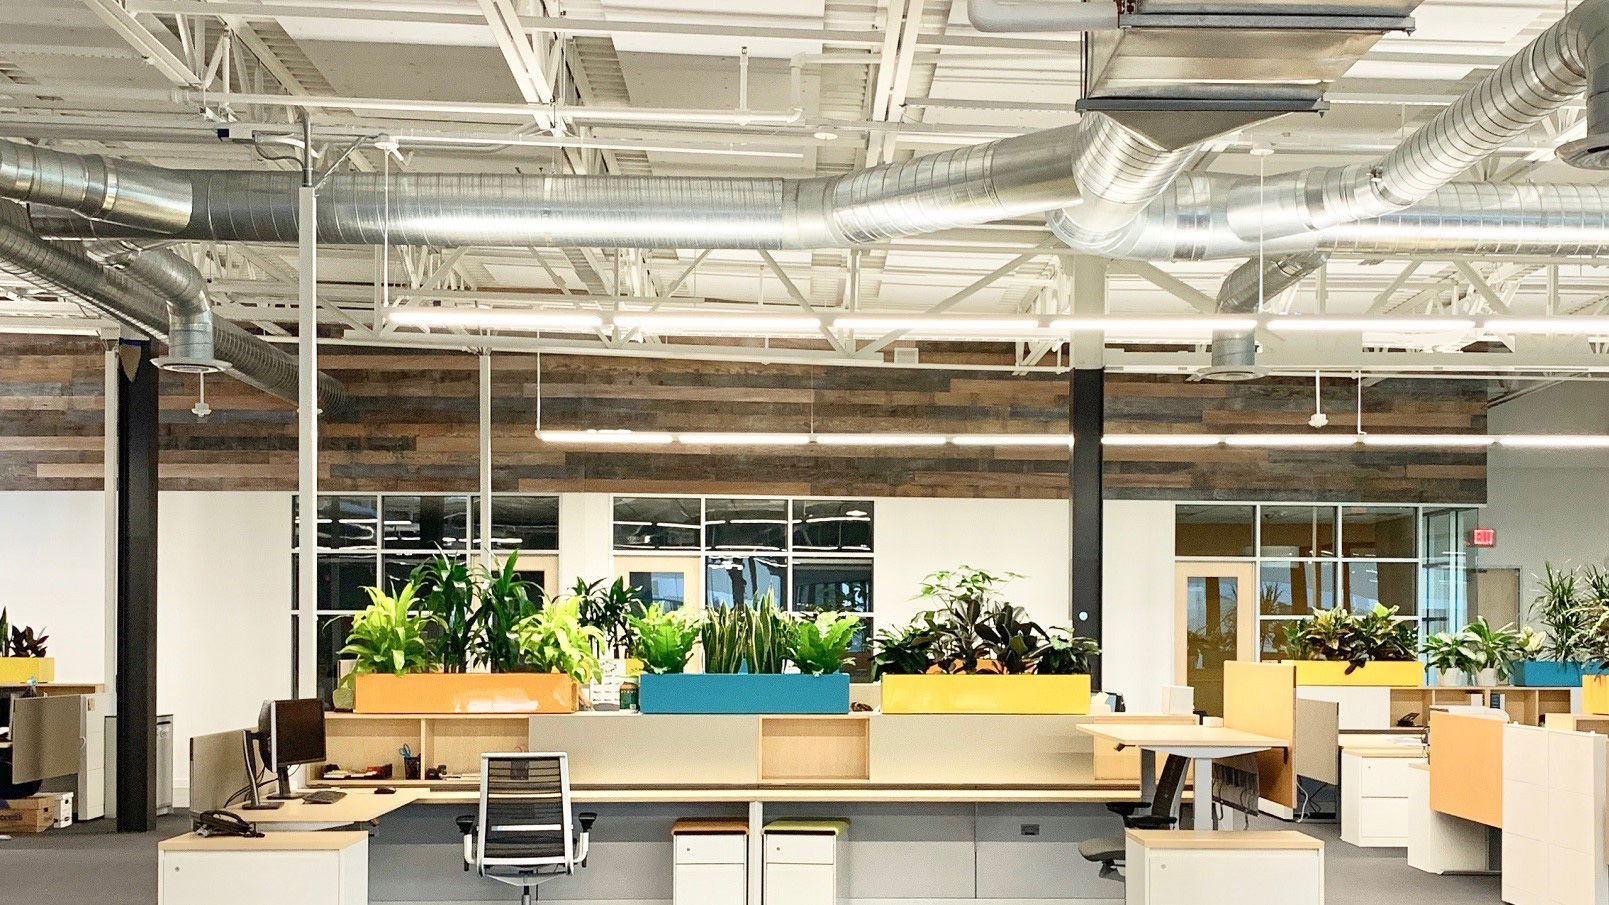 Tenant-Improvements-Rohnert-Park-TMI-2-3-Exposed-industrial-ceiling